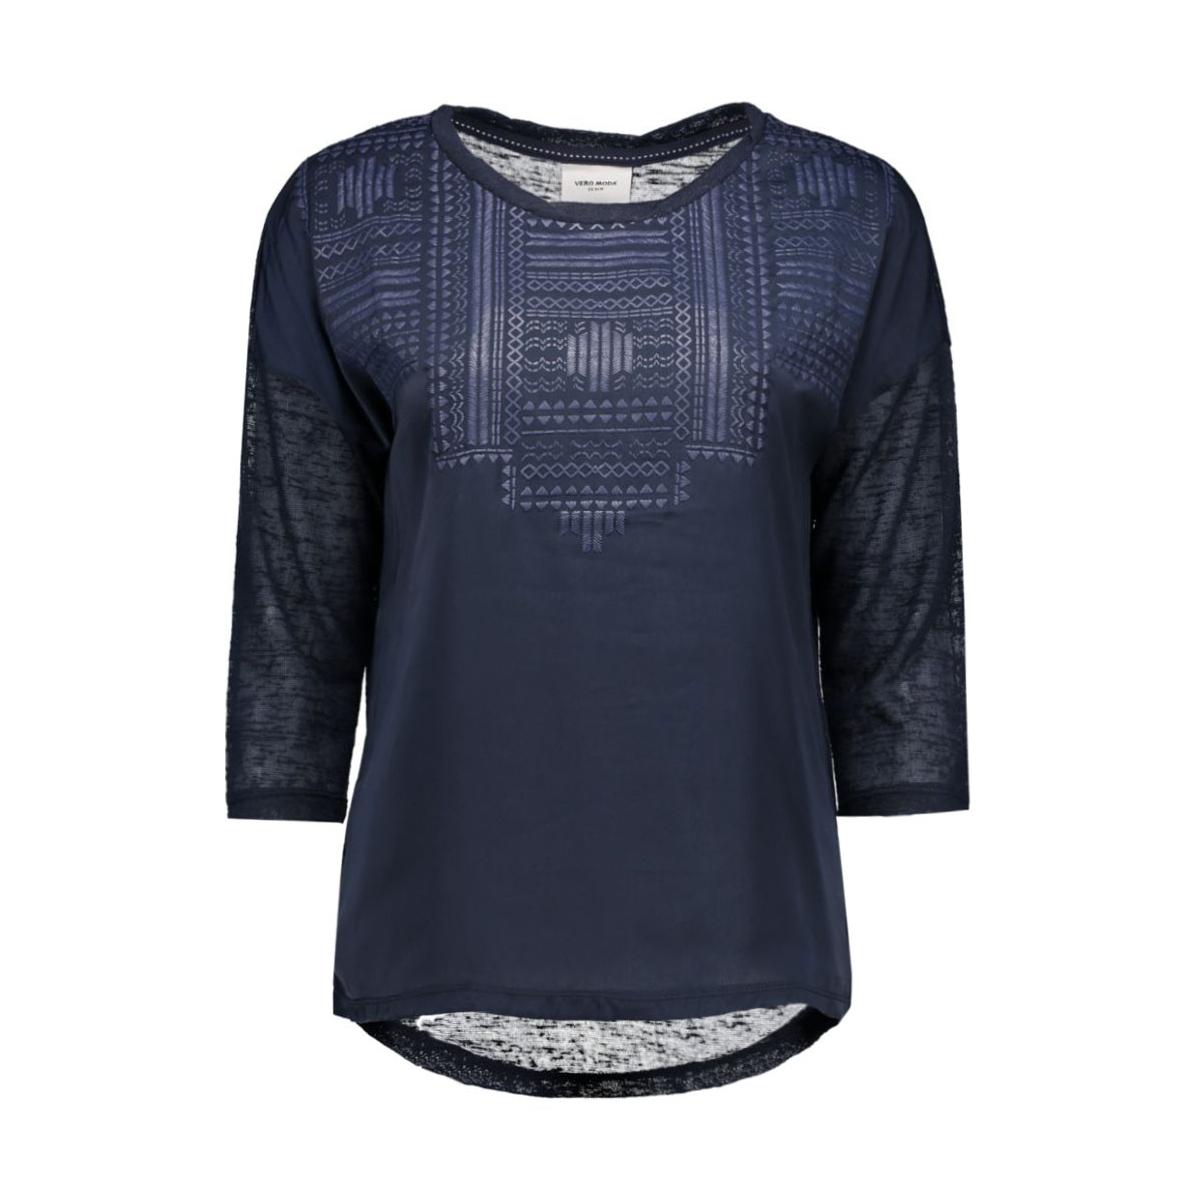 vmsally 3/4 foam print top dnm jrs 10162010 vero moda t-shirt navy blazer